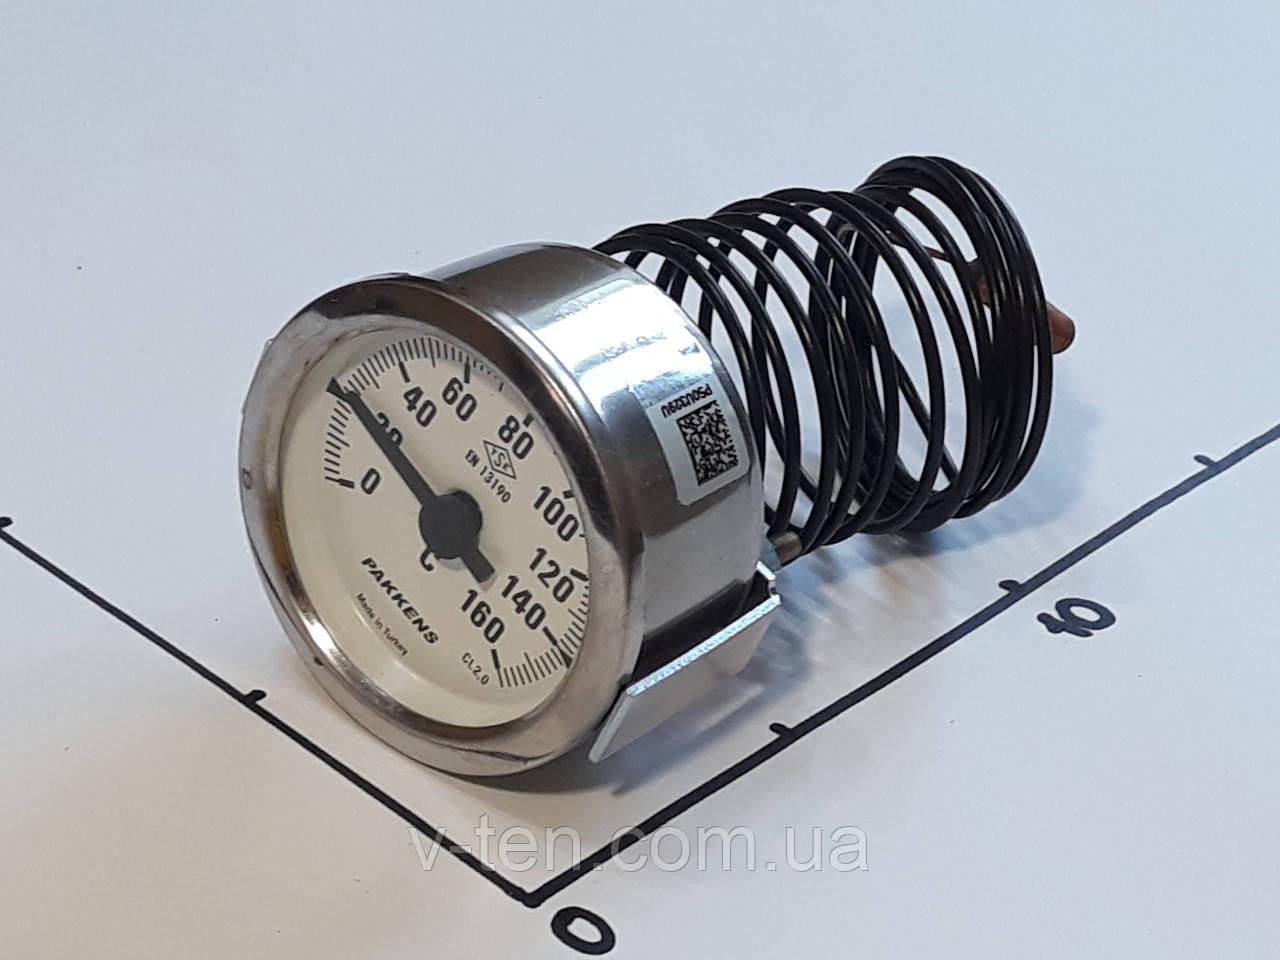 Термометр Ø60мм / 160°С / L-200 cм капиллярный PAKKENS (Турция)